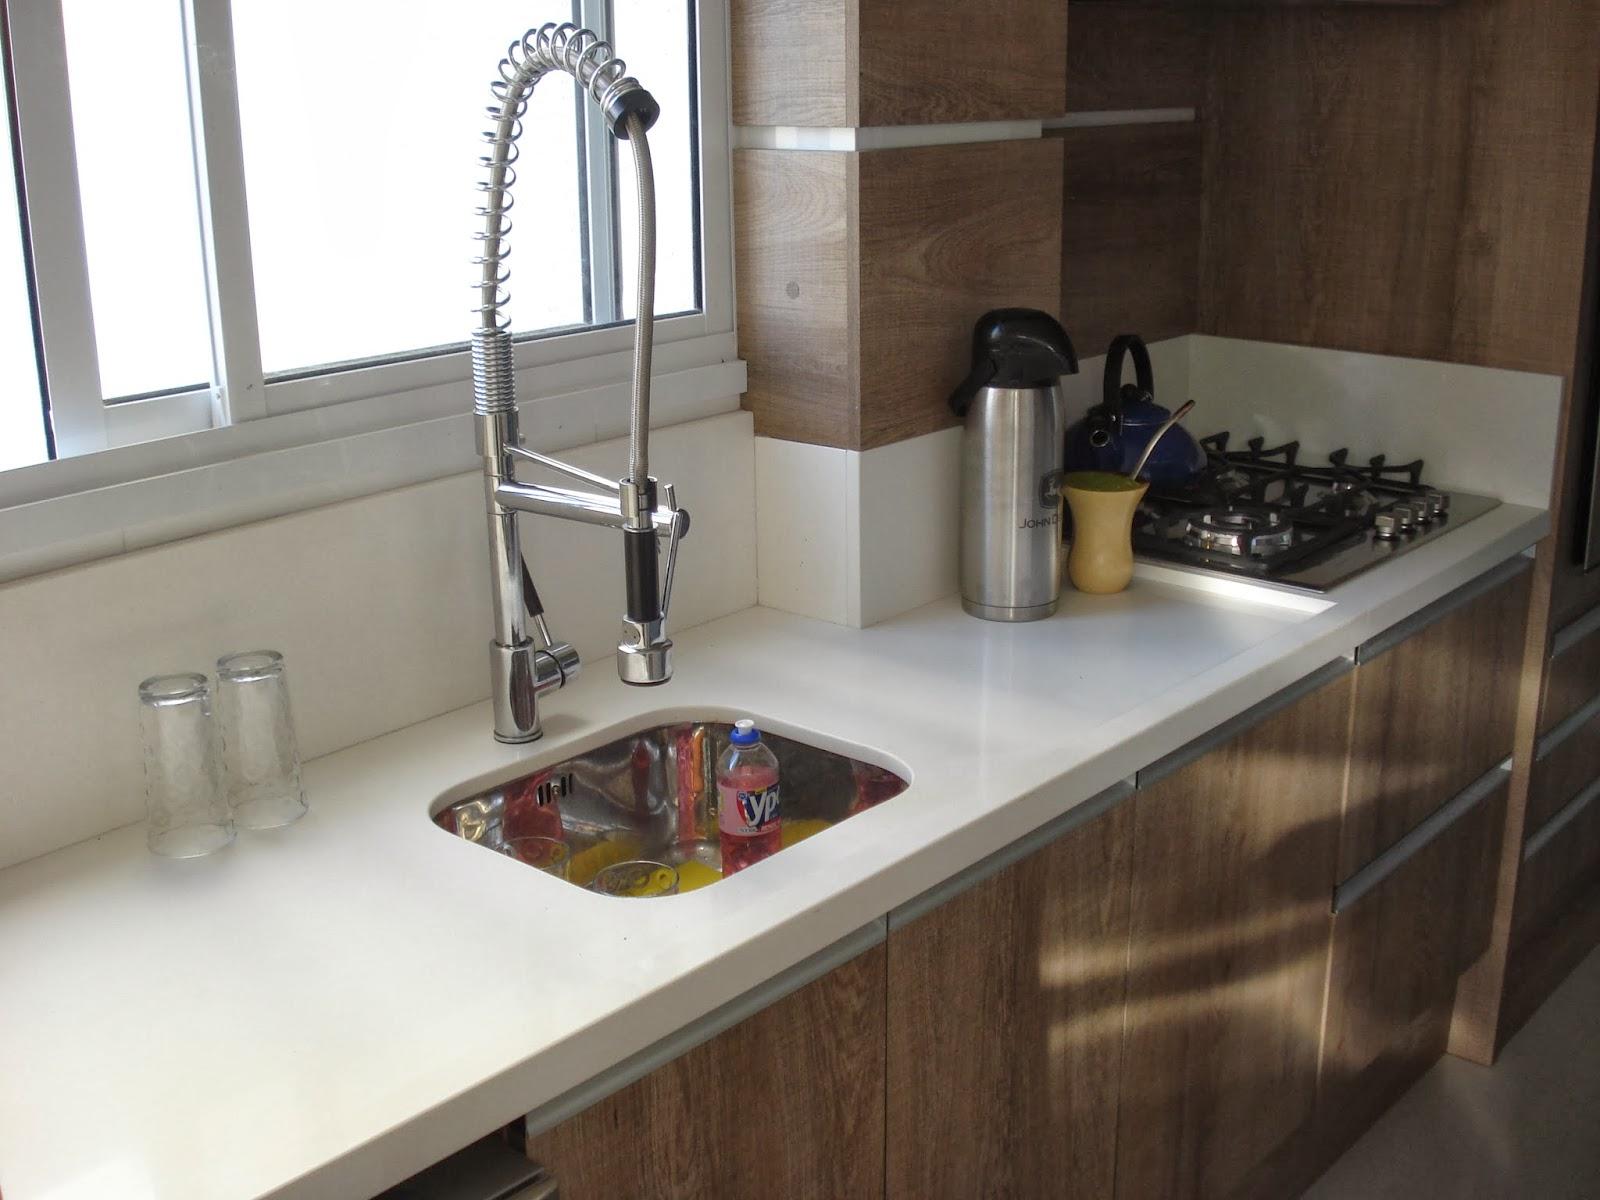 Cozinha de Silestone Branco Marmoraria MPK #5D4735 1600 1200